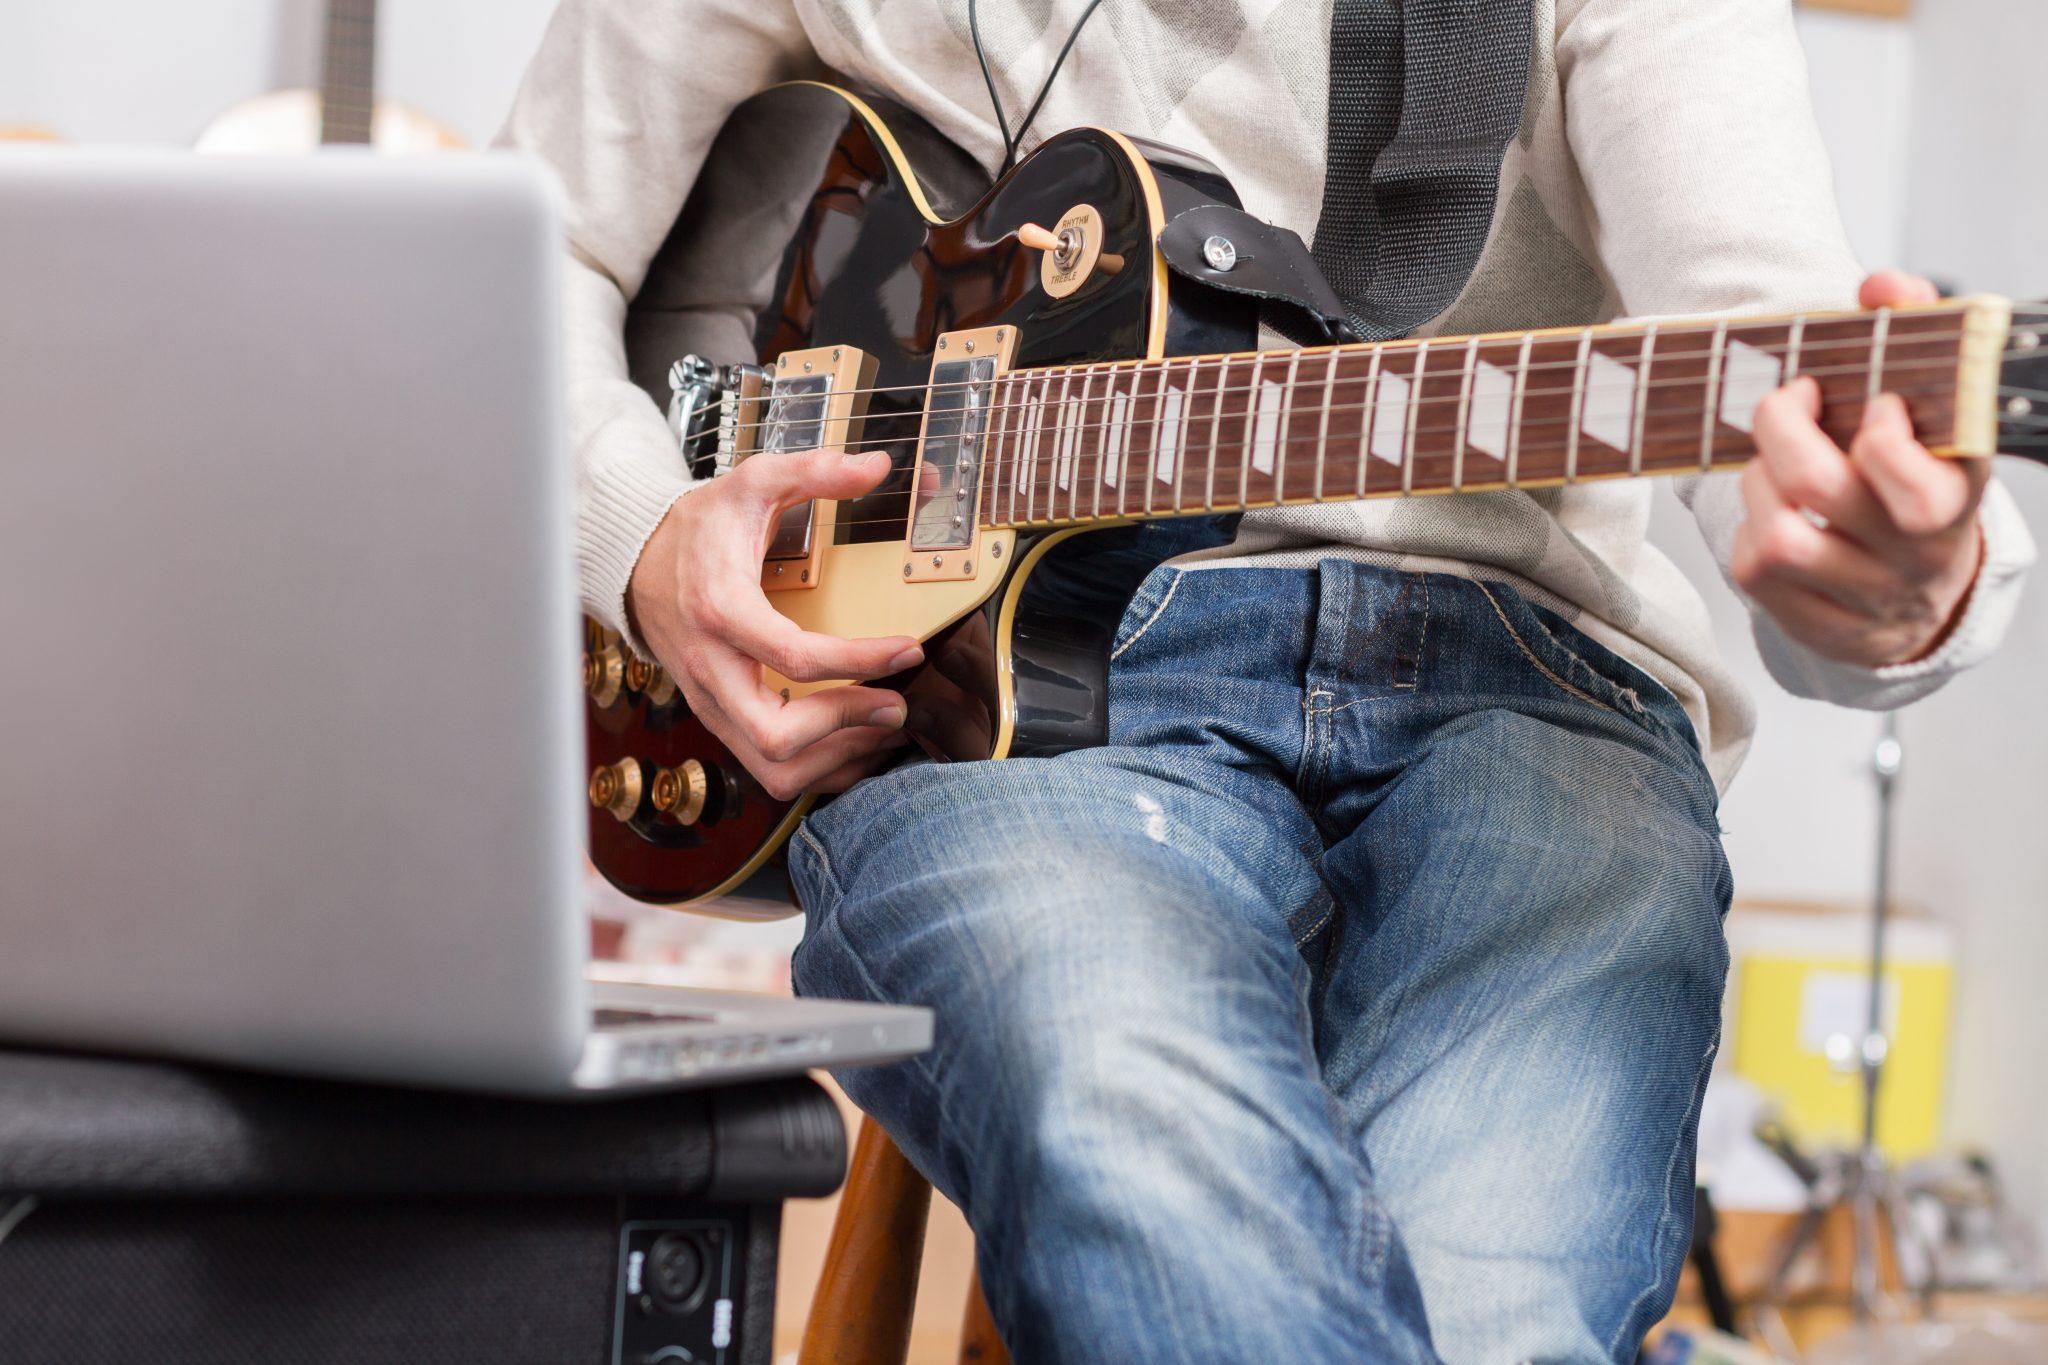 Man playing guitar for DAW